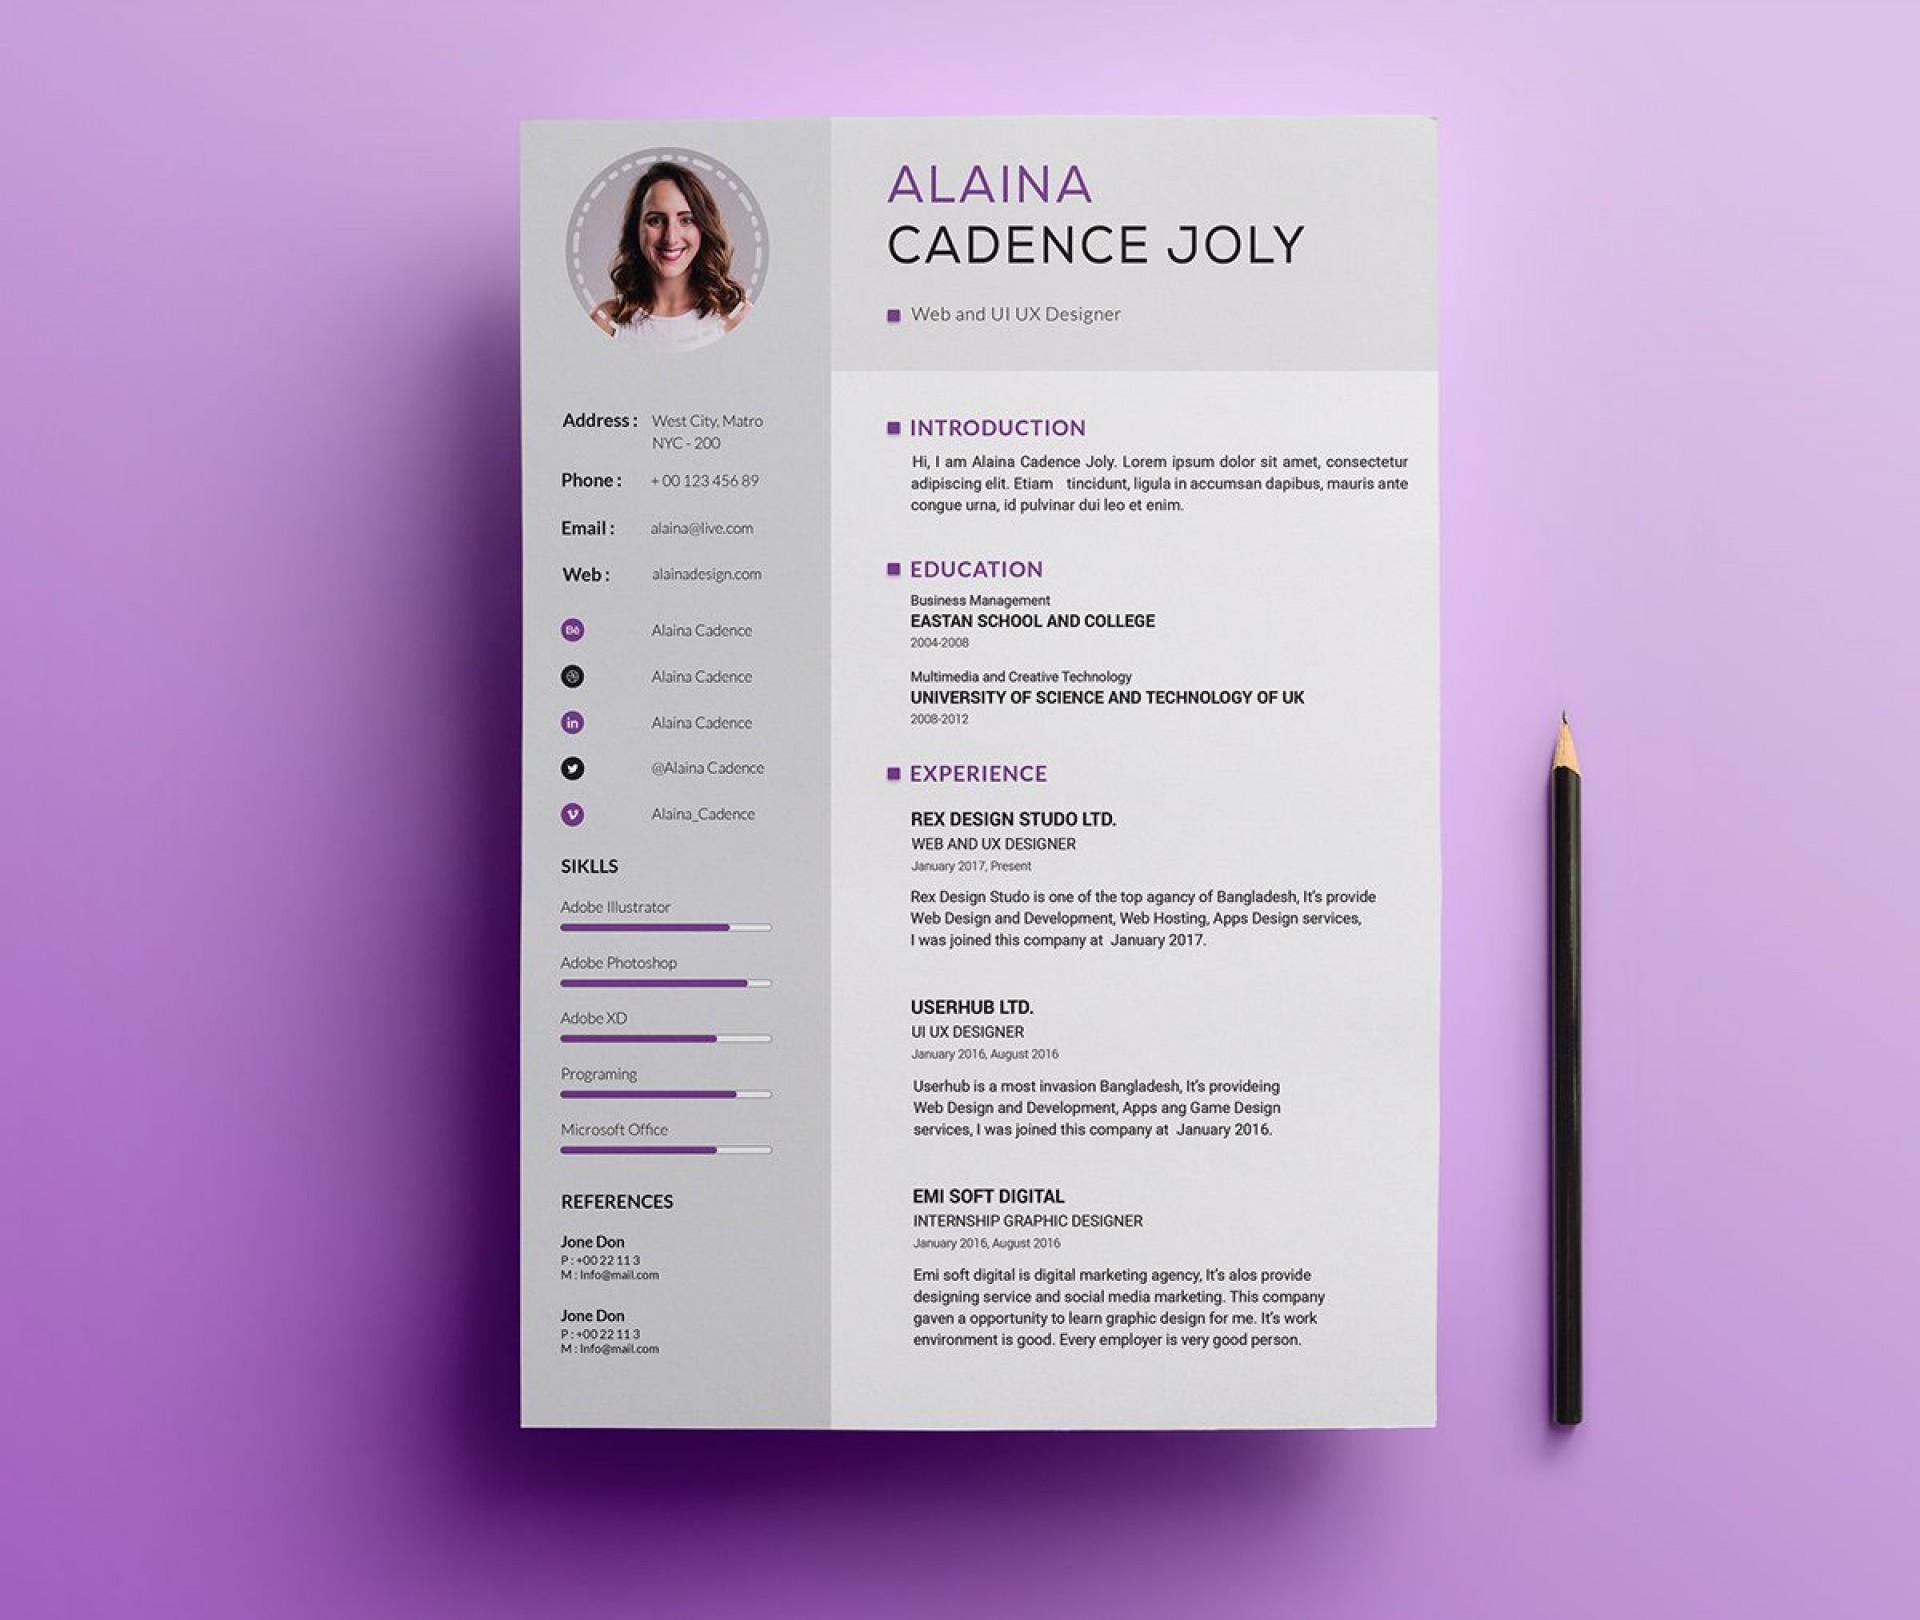 005 Impressive Professional Resume Template 2018 Free Download Idea 1920